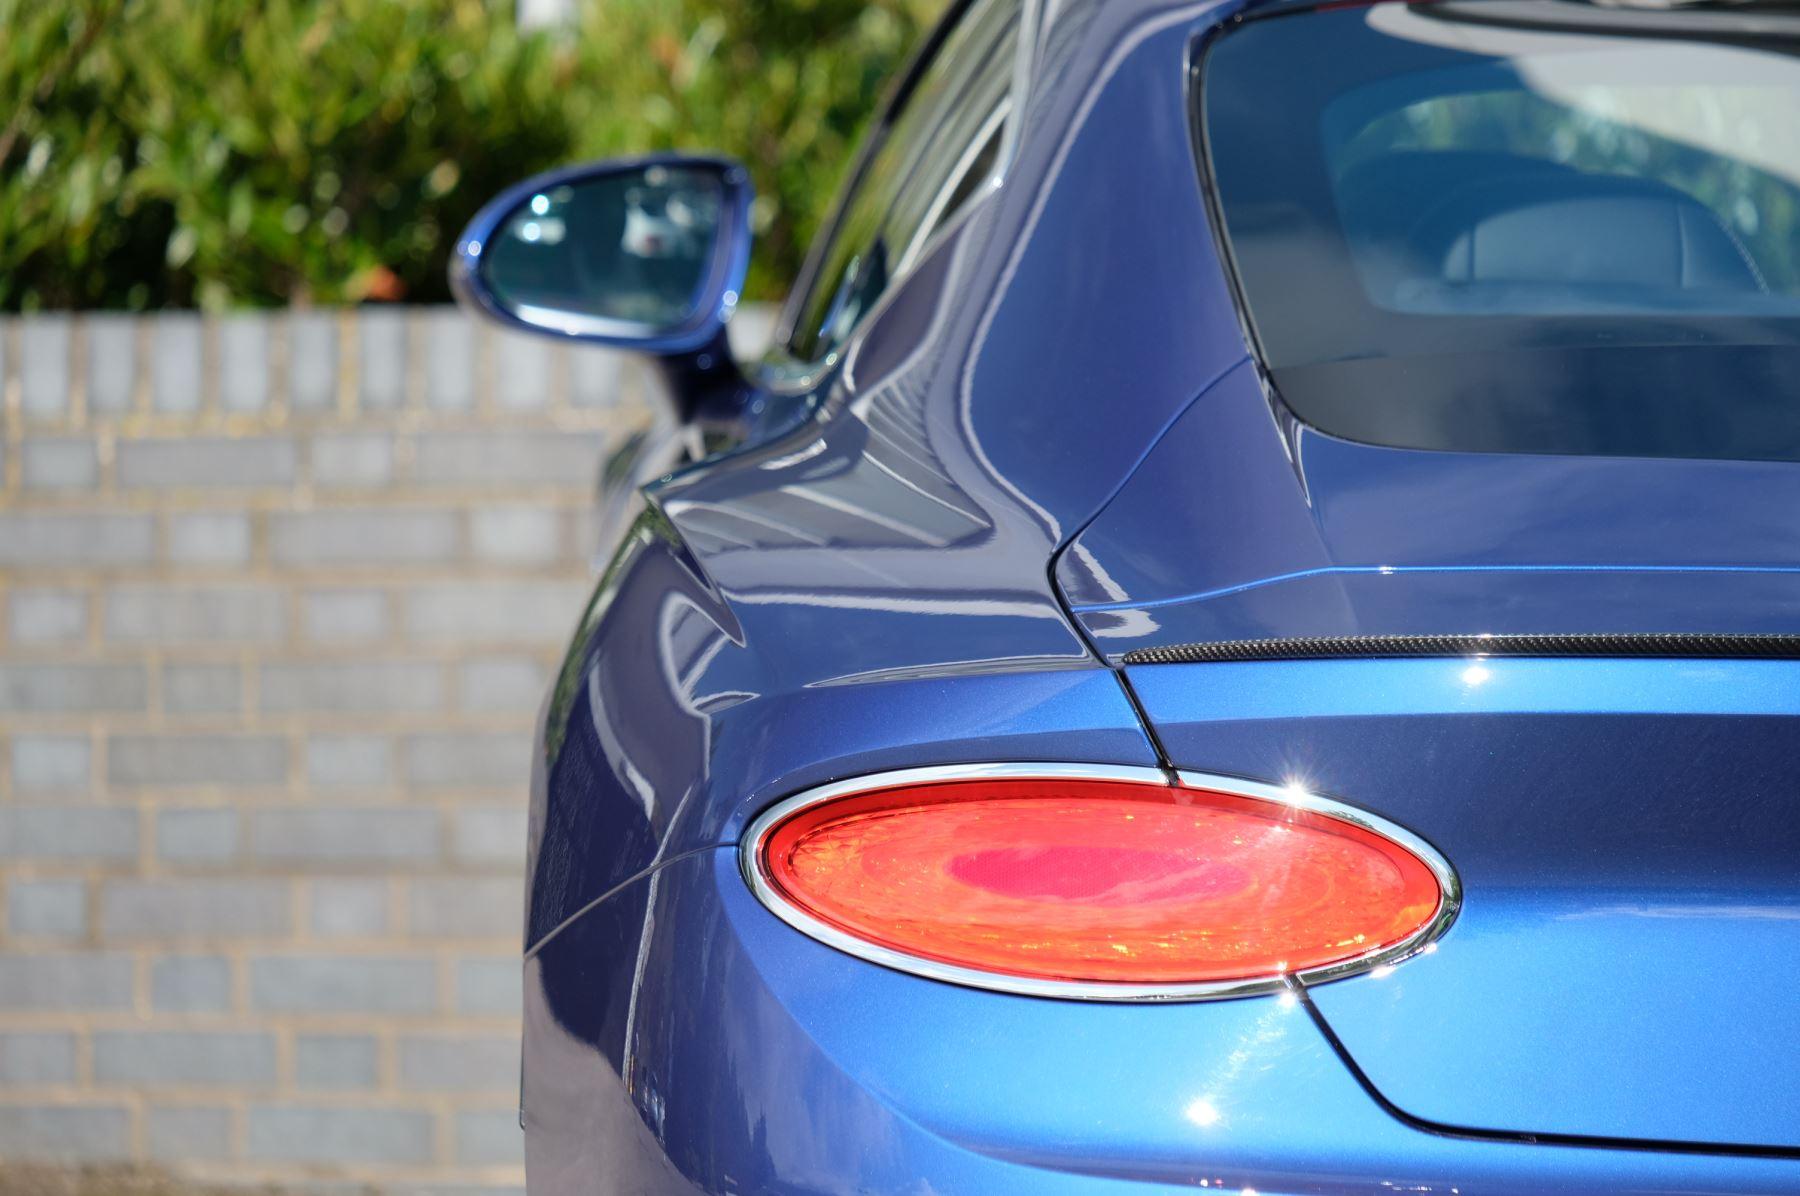 Bentley Continental GT 4.0 V8 2dr Mulliner Driving Specification image 7